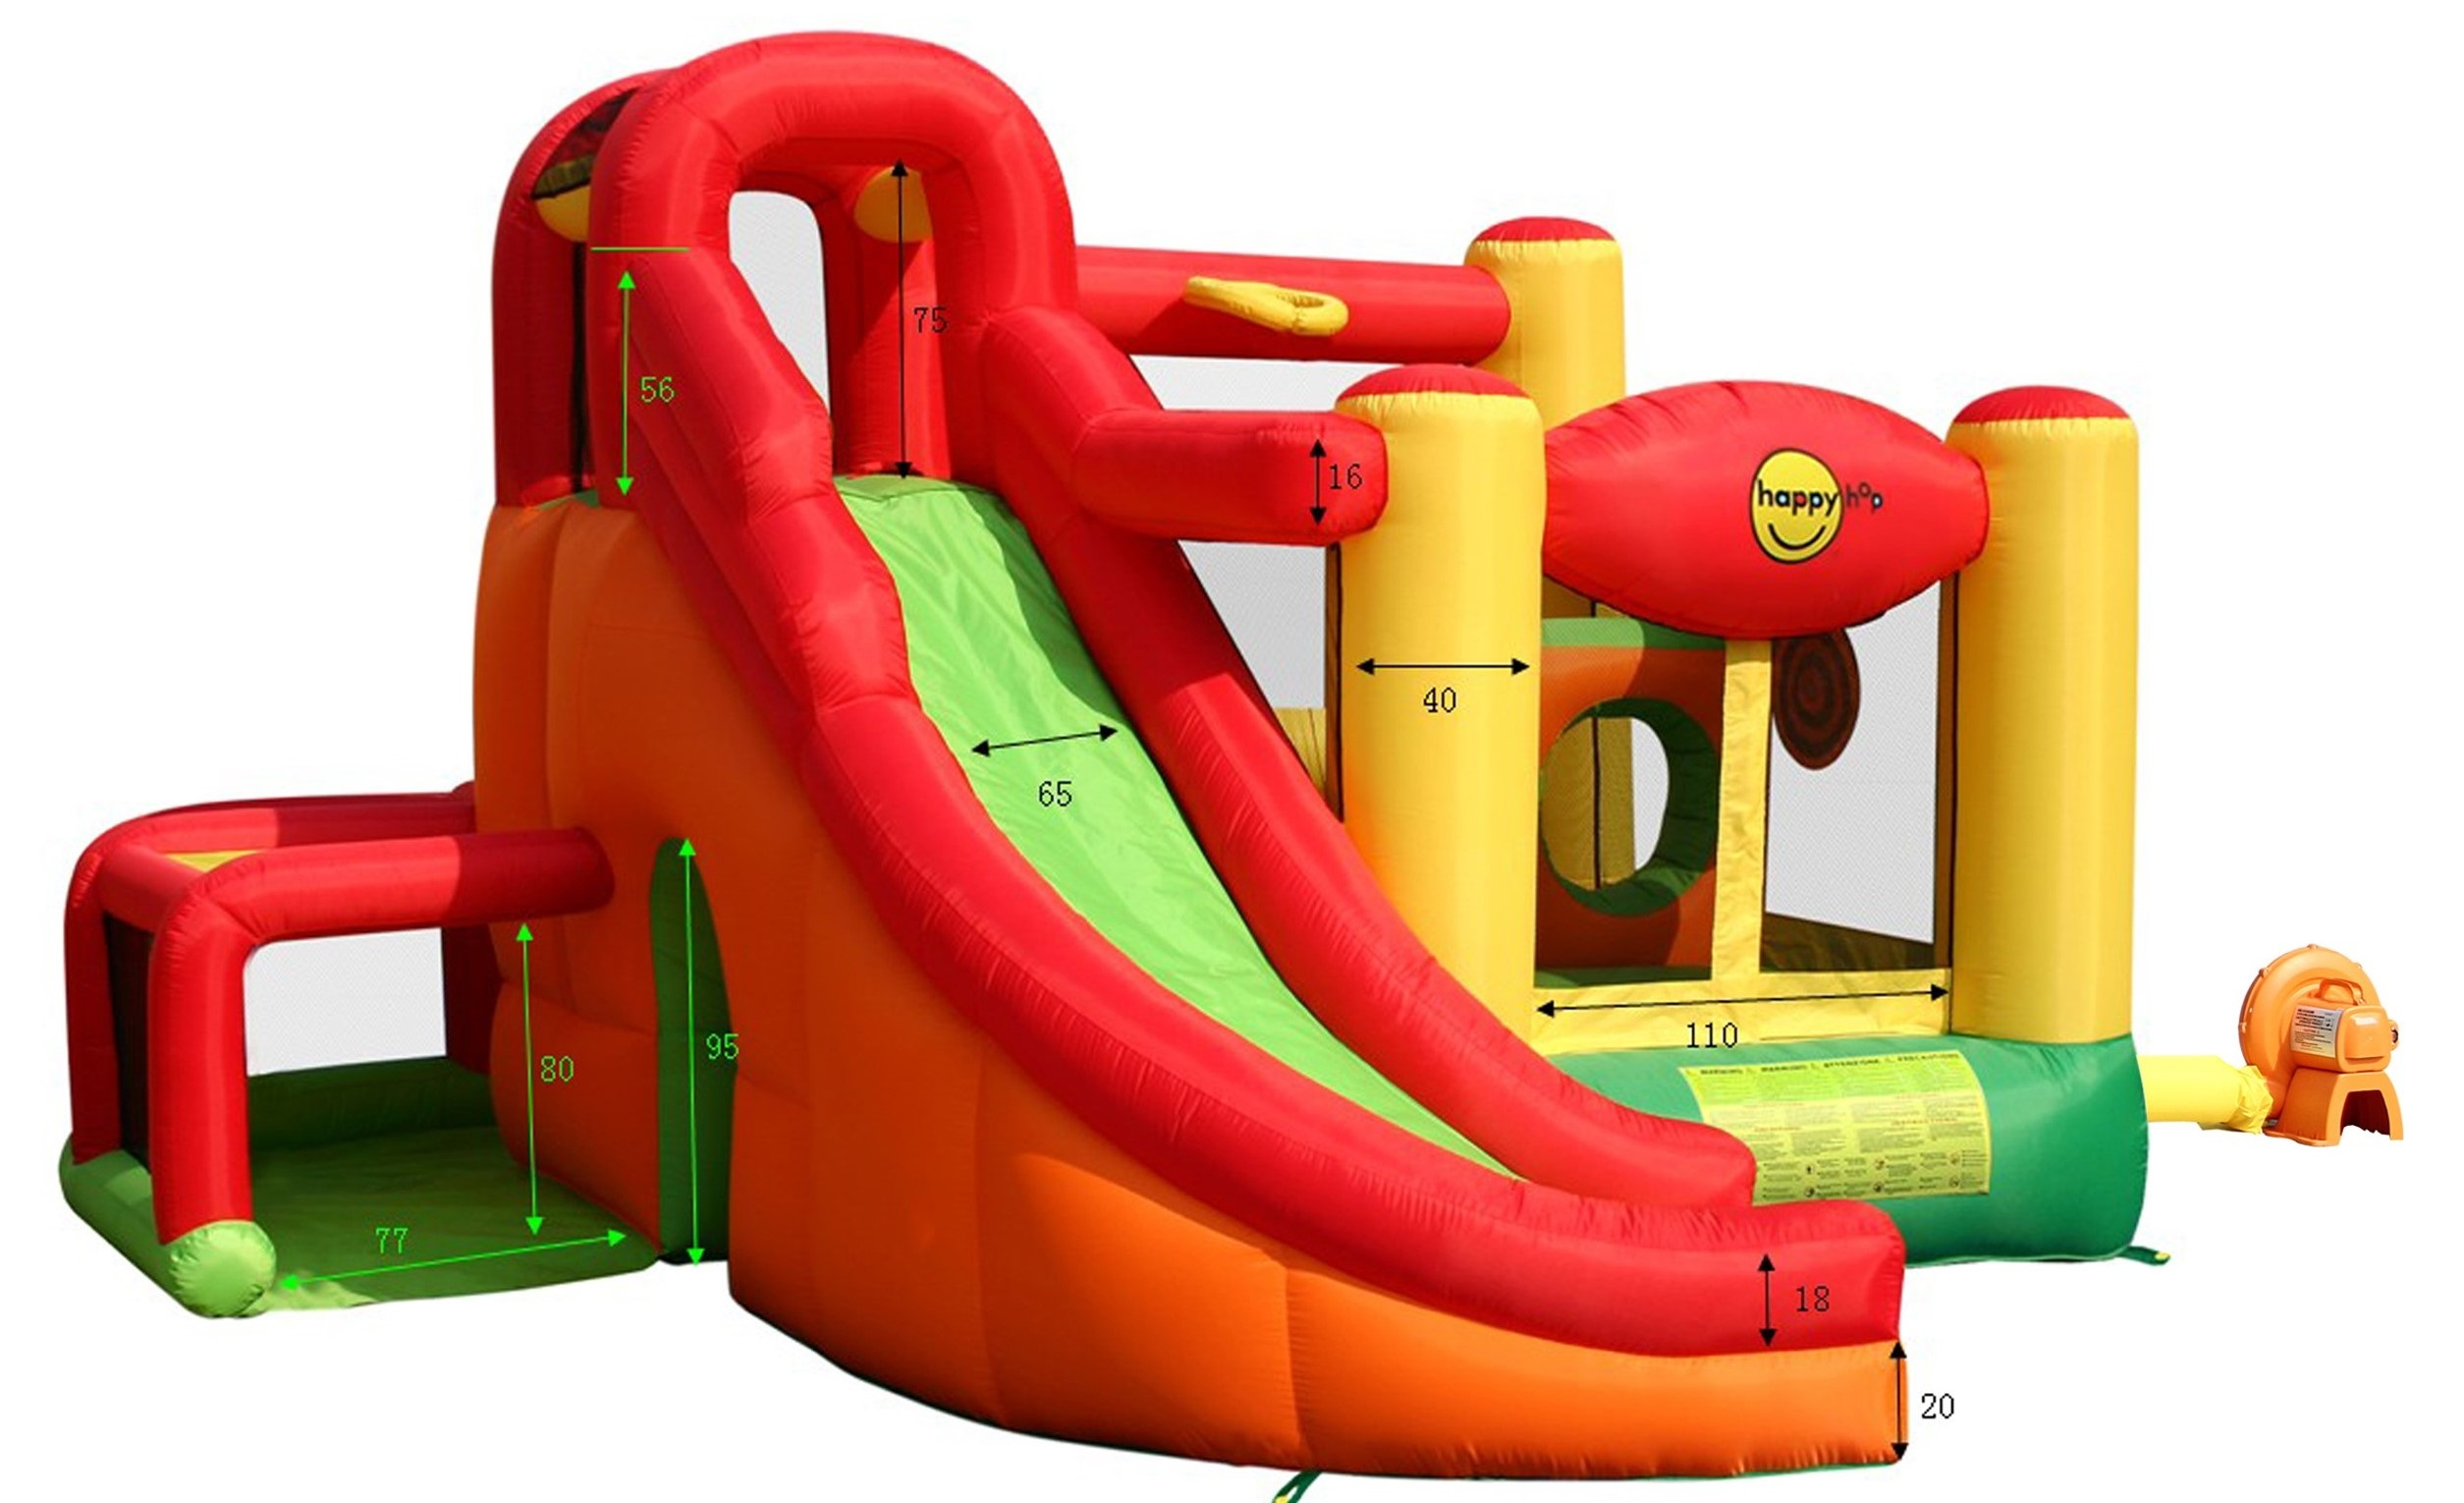 Happy hop rozmery 9206, playcentrum happy hop